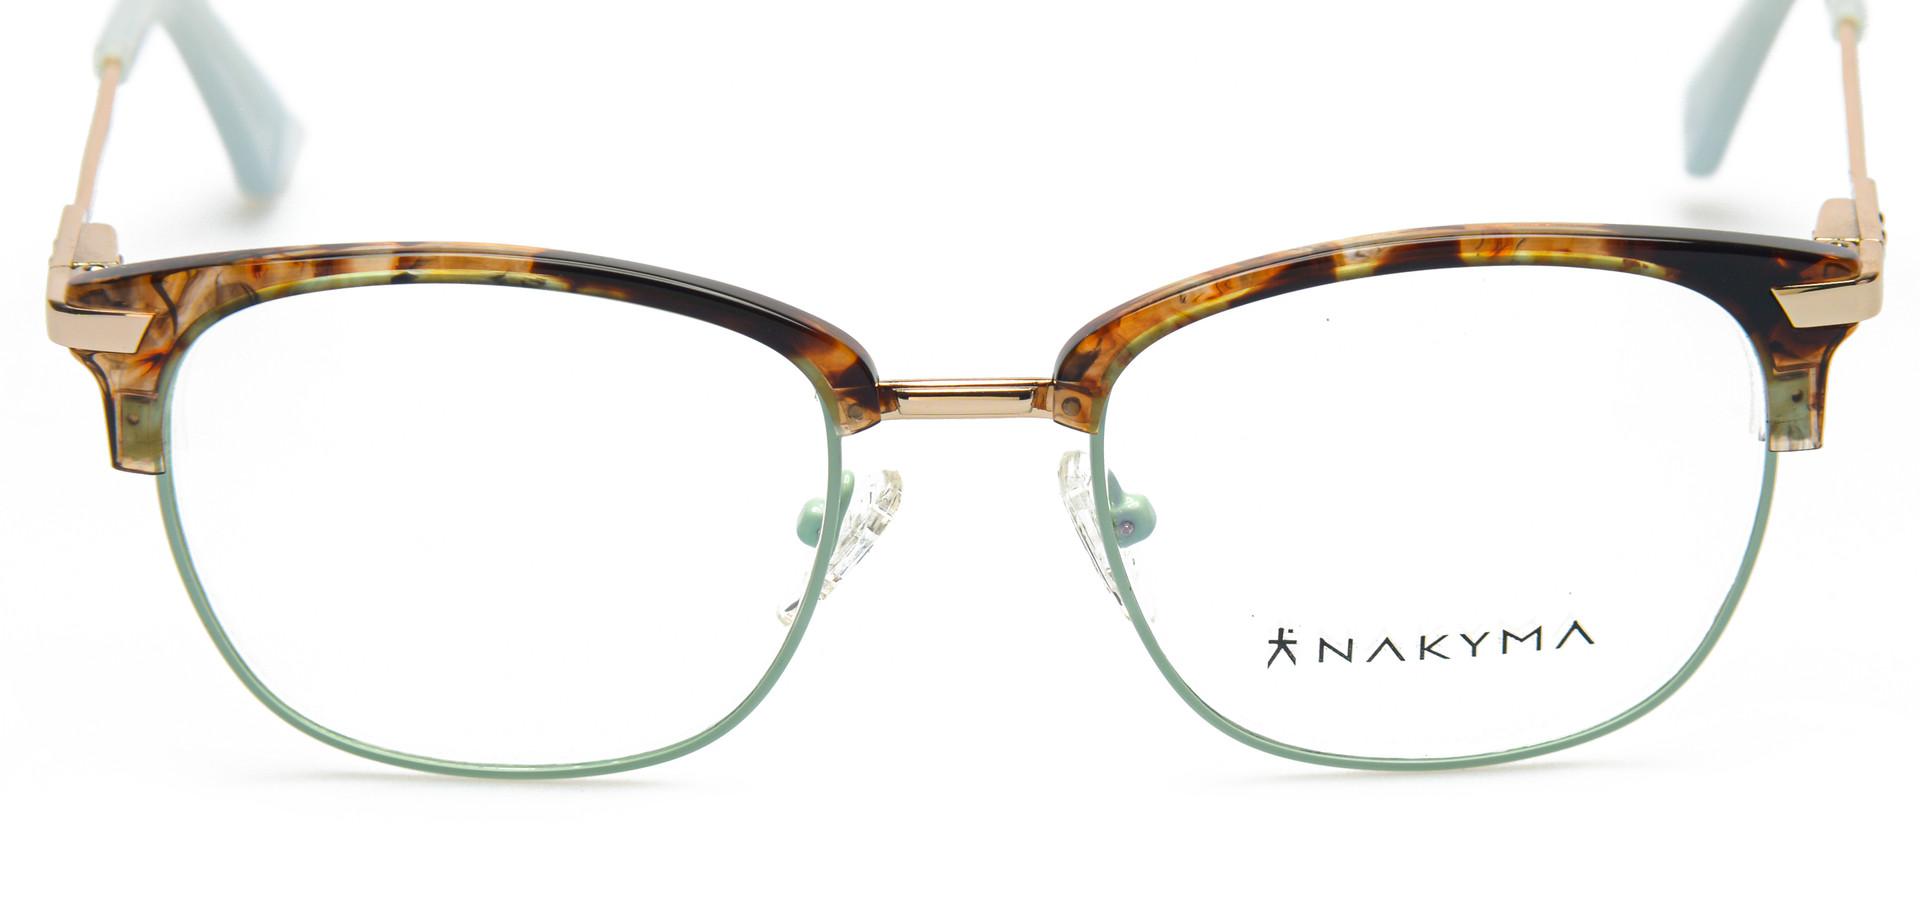 8R1-NAKYMA-V09-C3